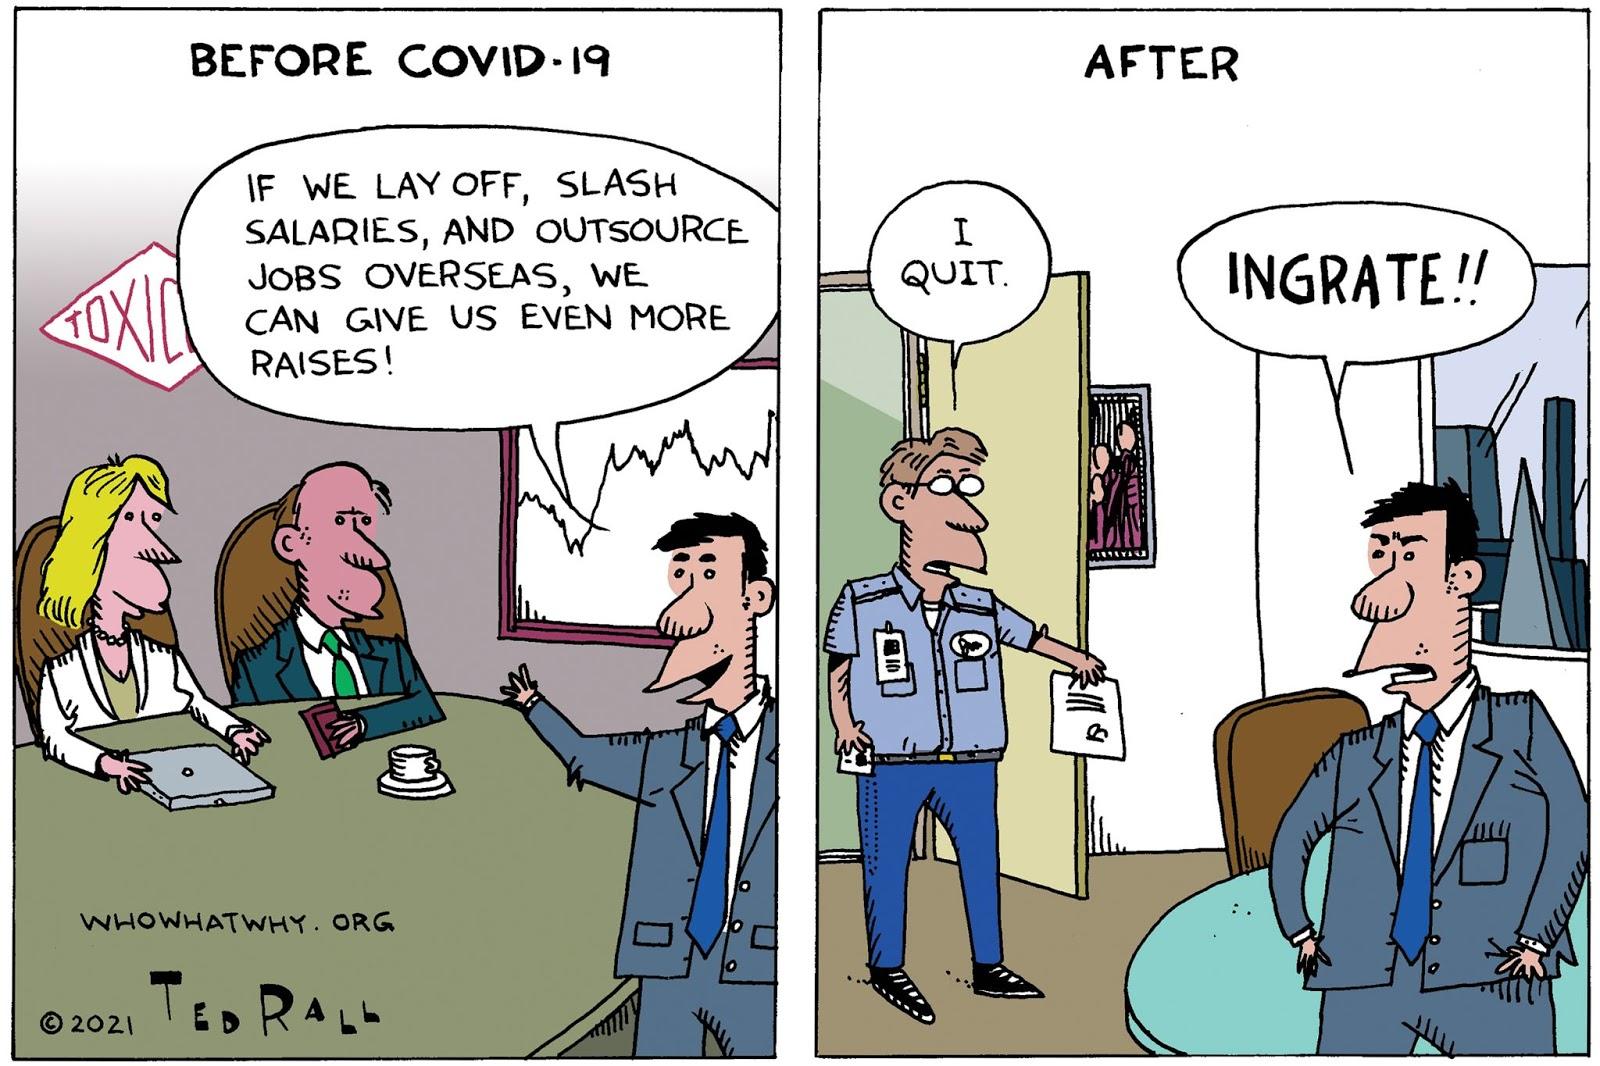 COVID-19, Employment, Jobs